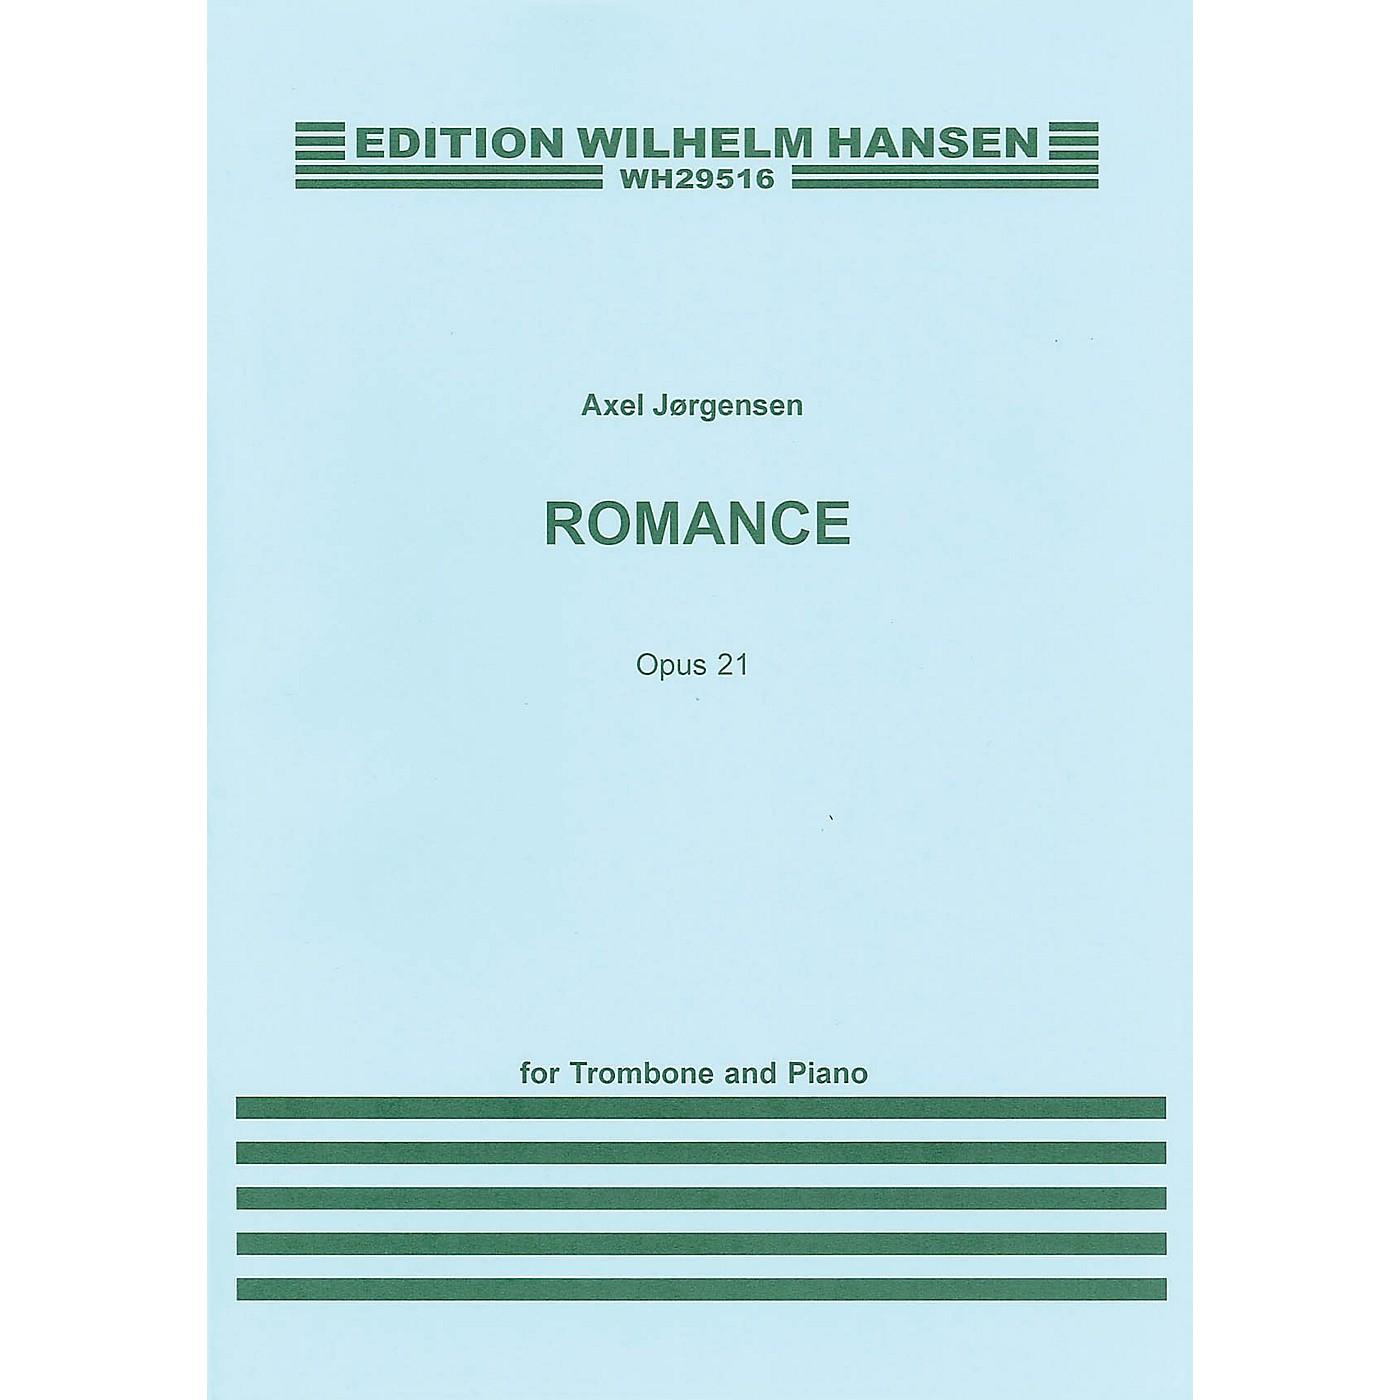 Wilhelm Hansen Romance Op. 21 (for Trombone and Piano) Music Sales America Series thumbnail